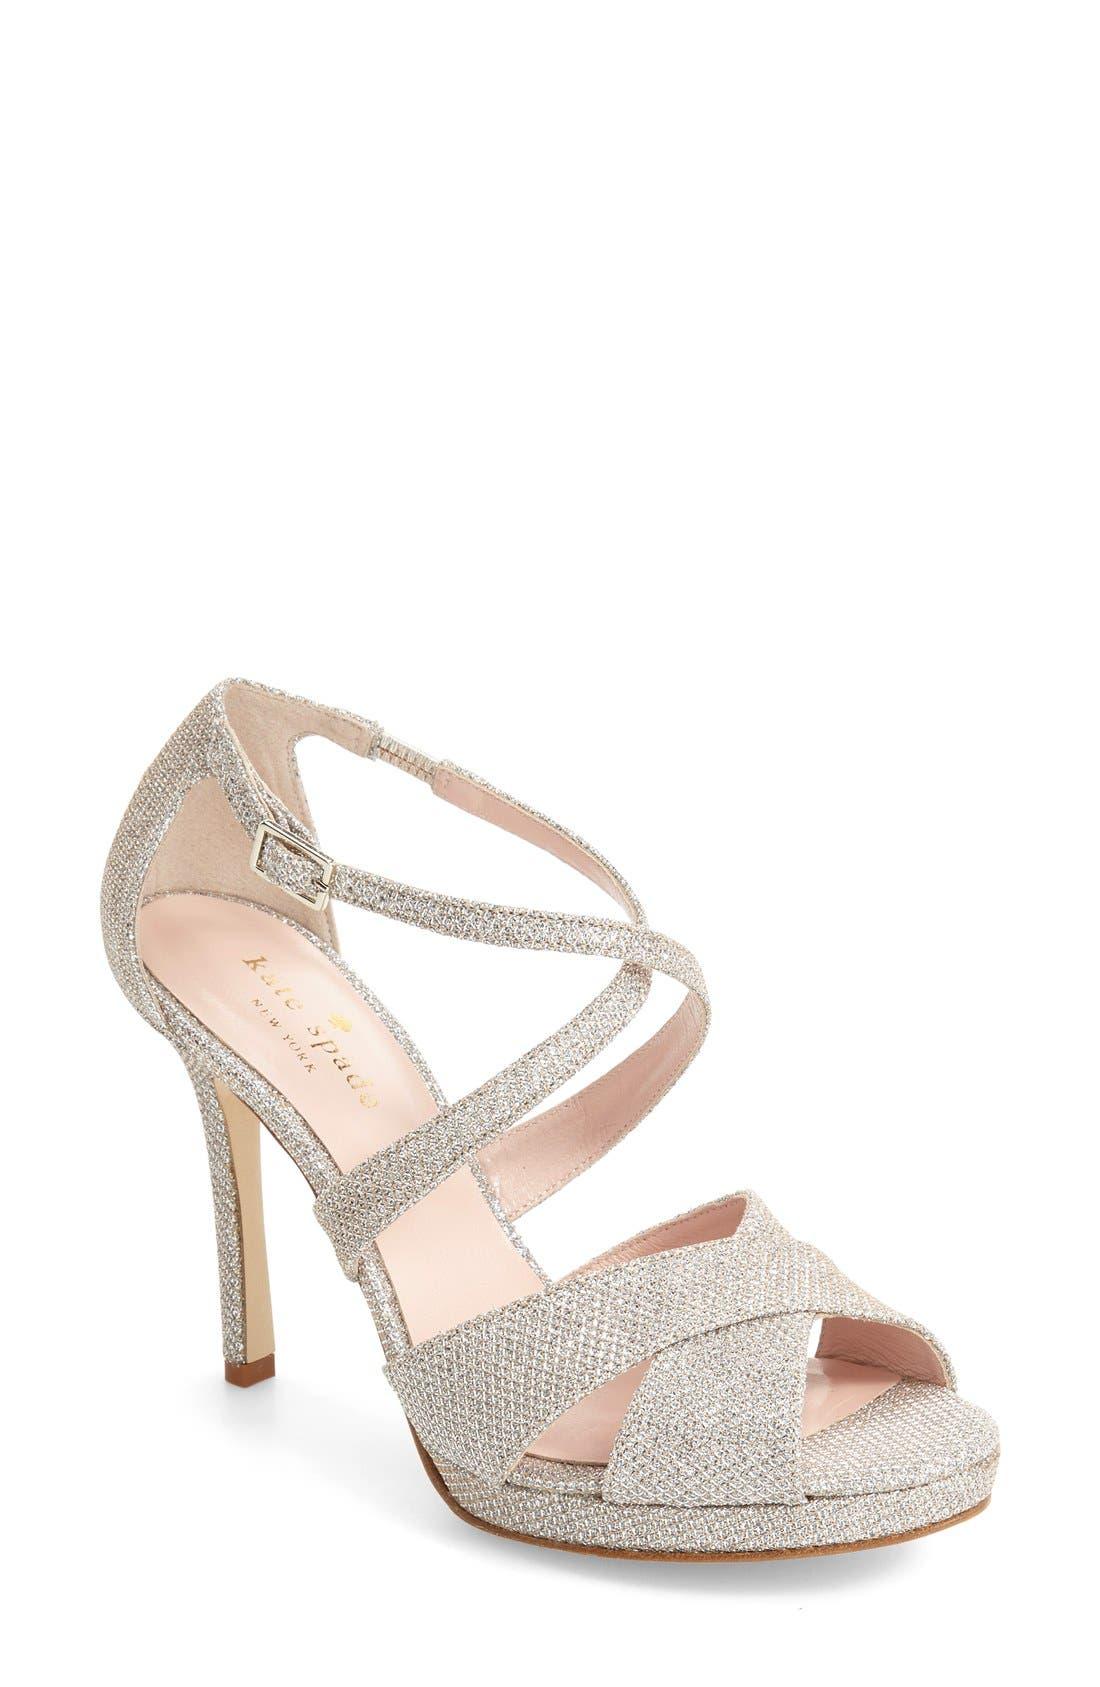 Main Image - kate spade new york frances platform sandal (Women)